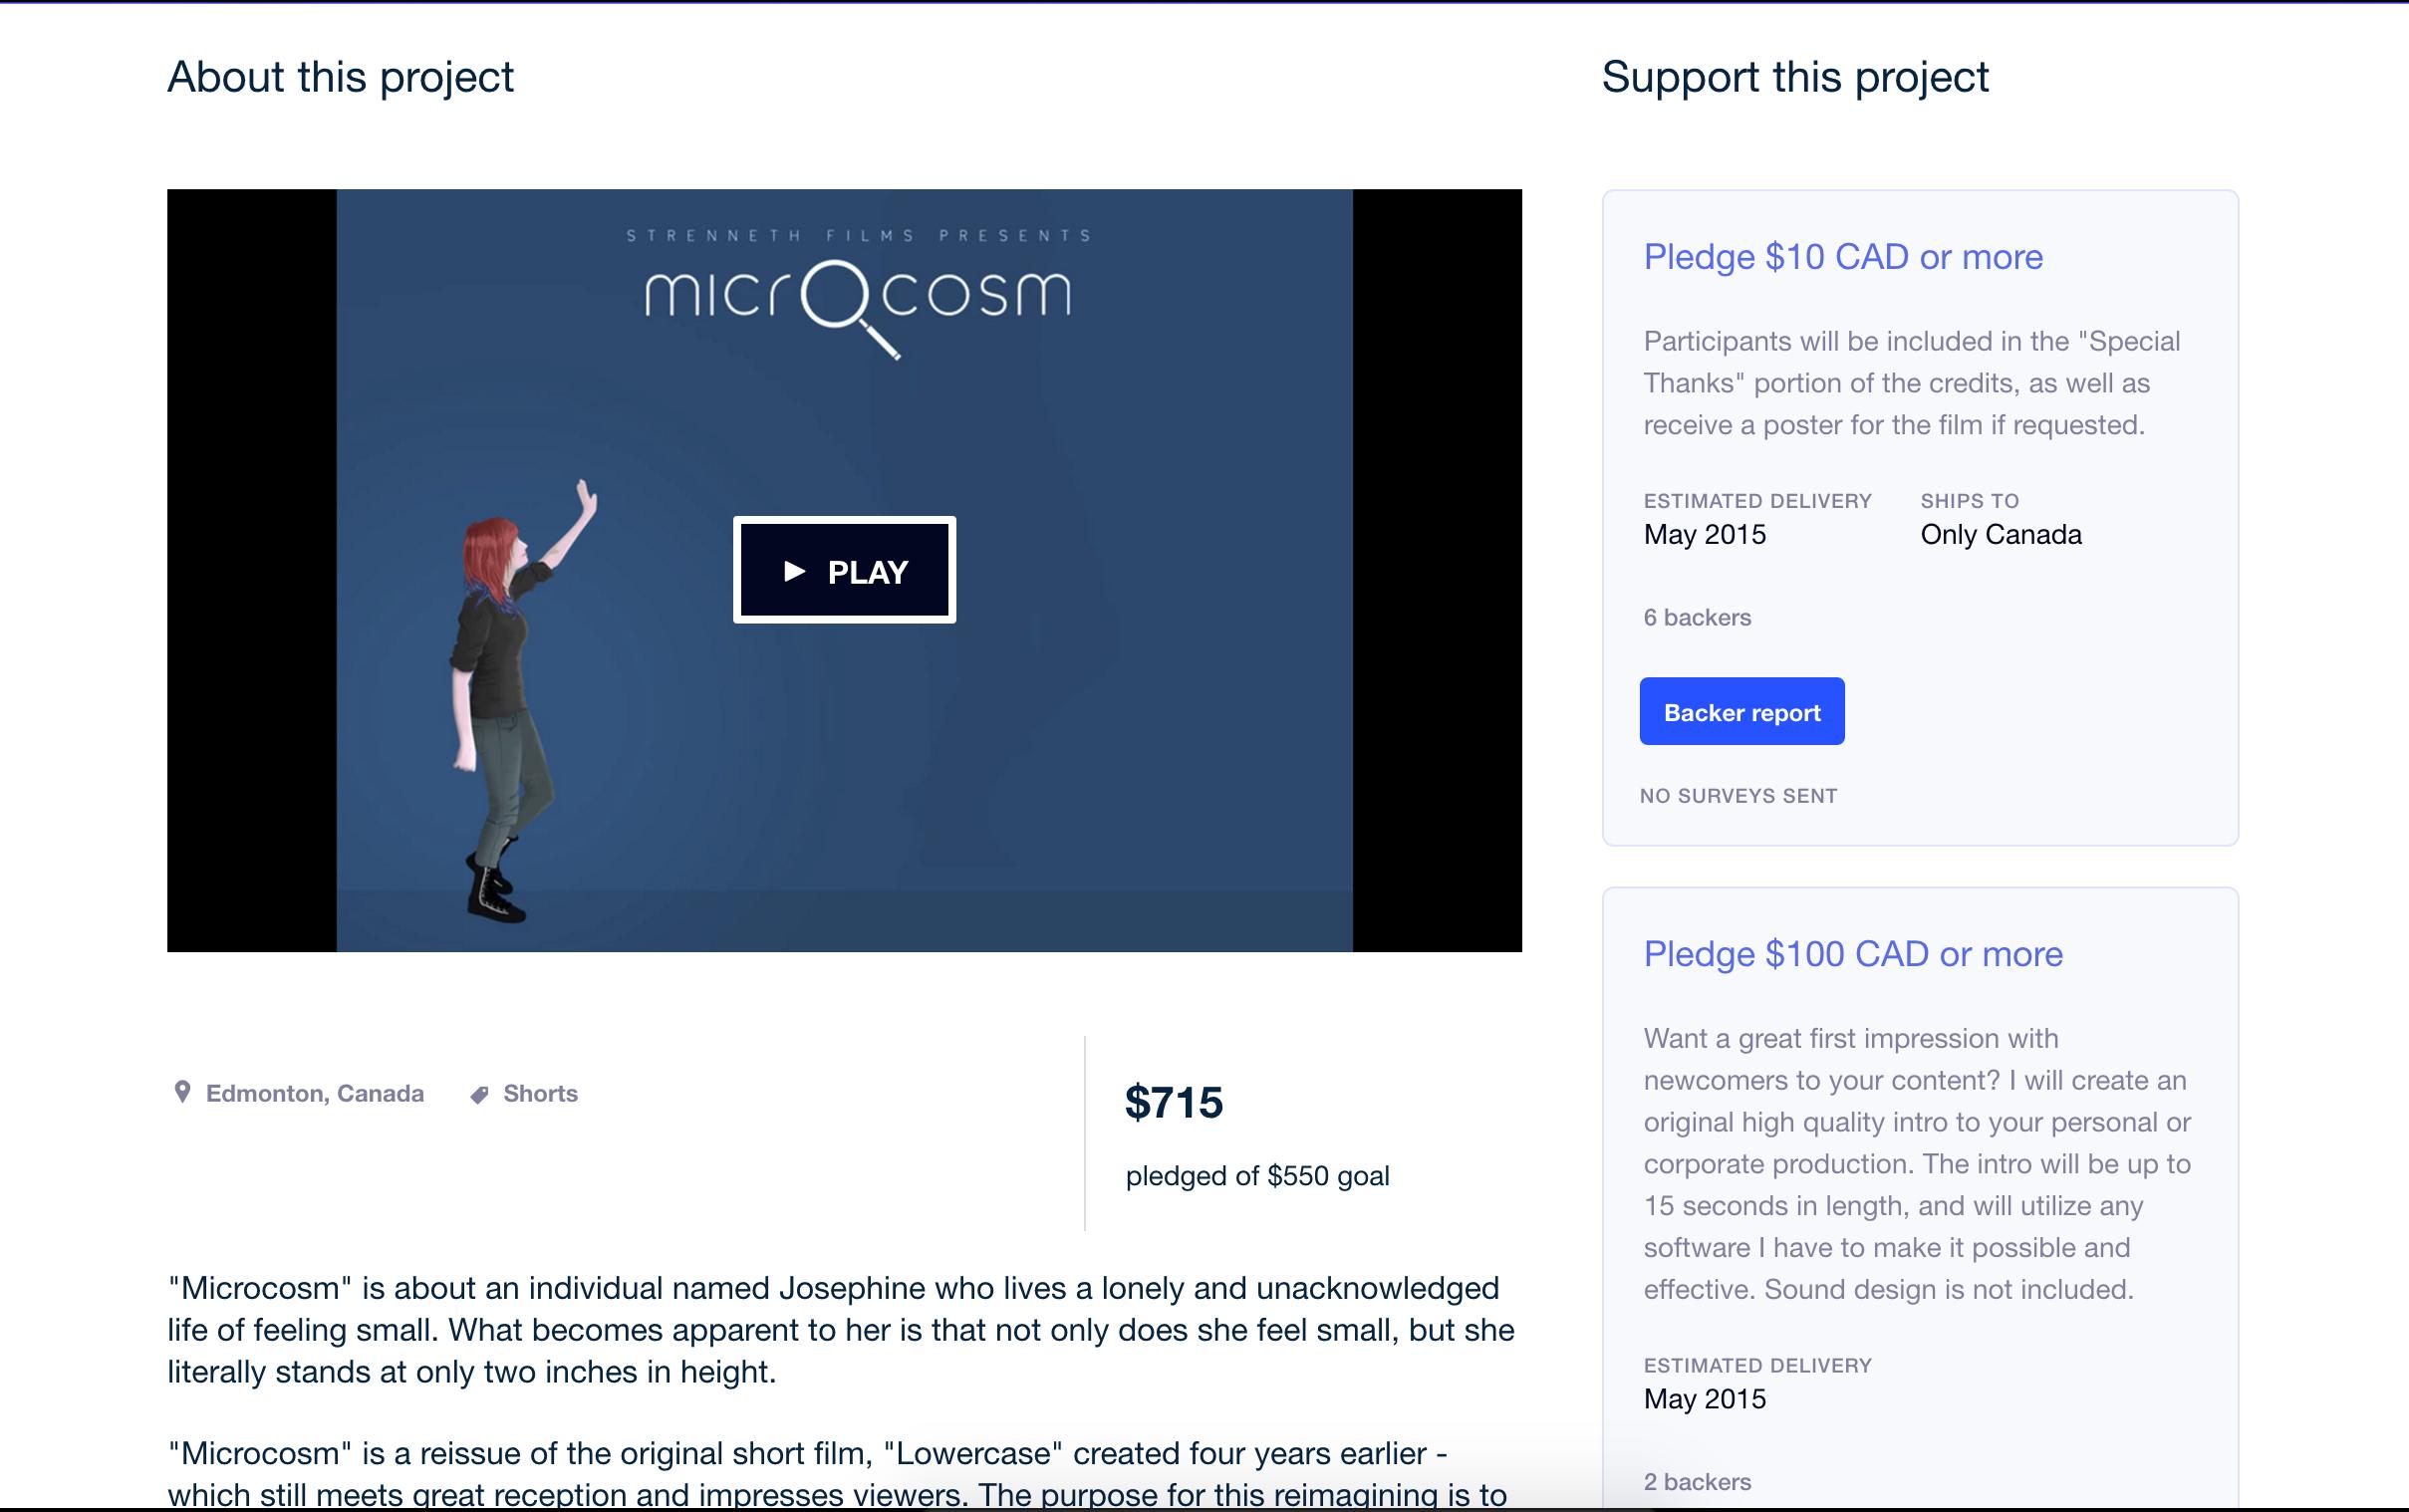 The Kickstarter campaign.